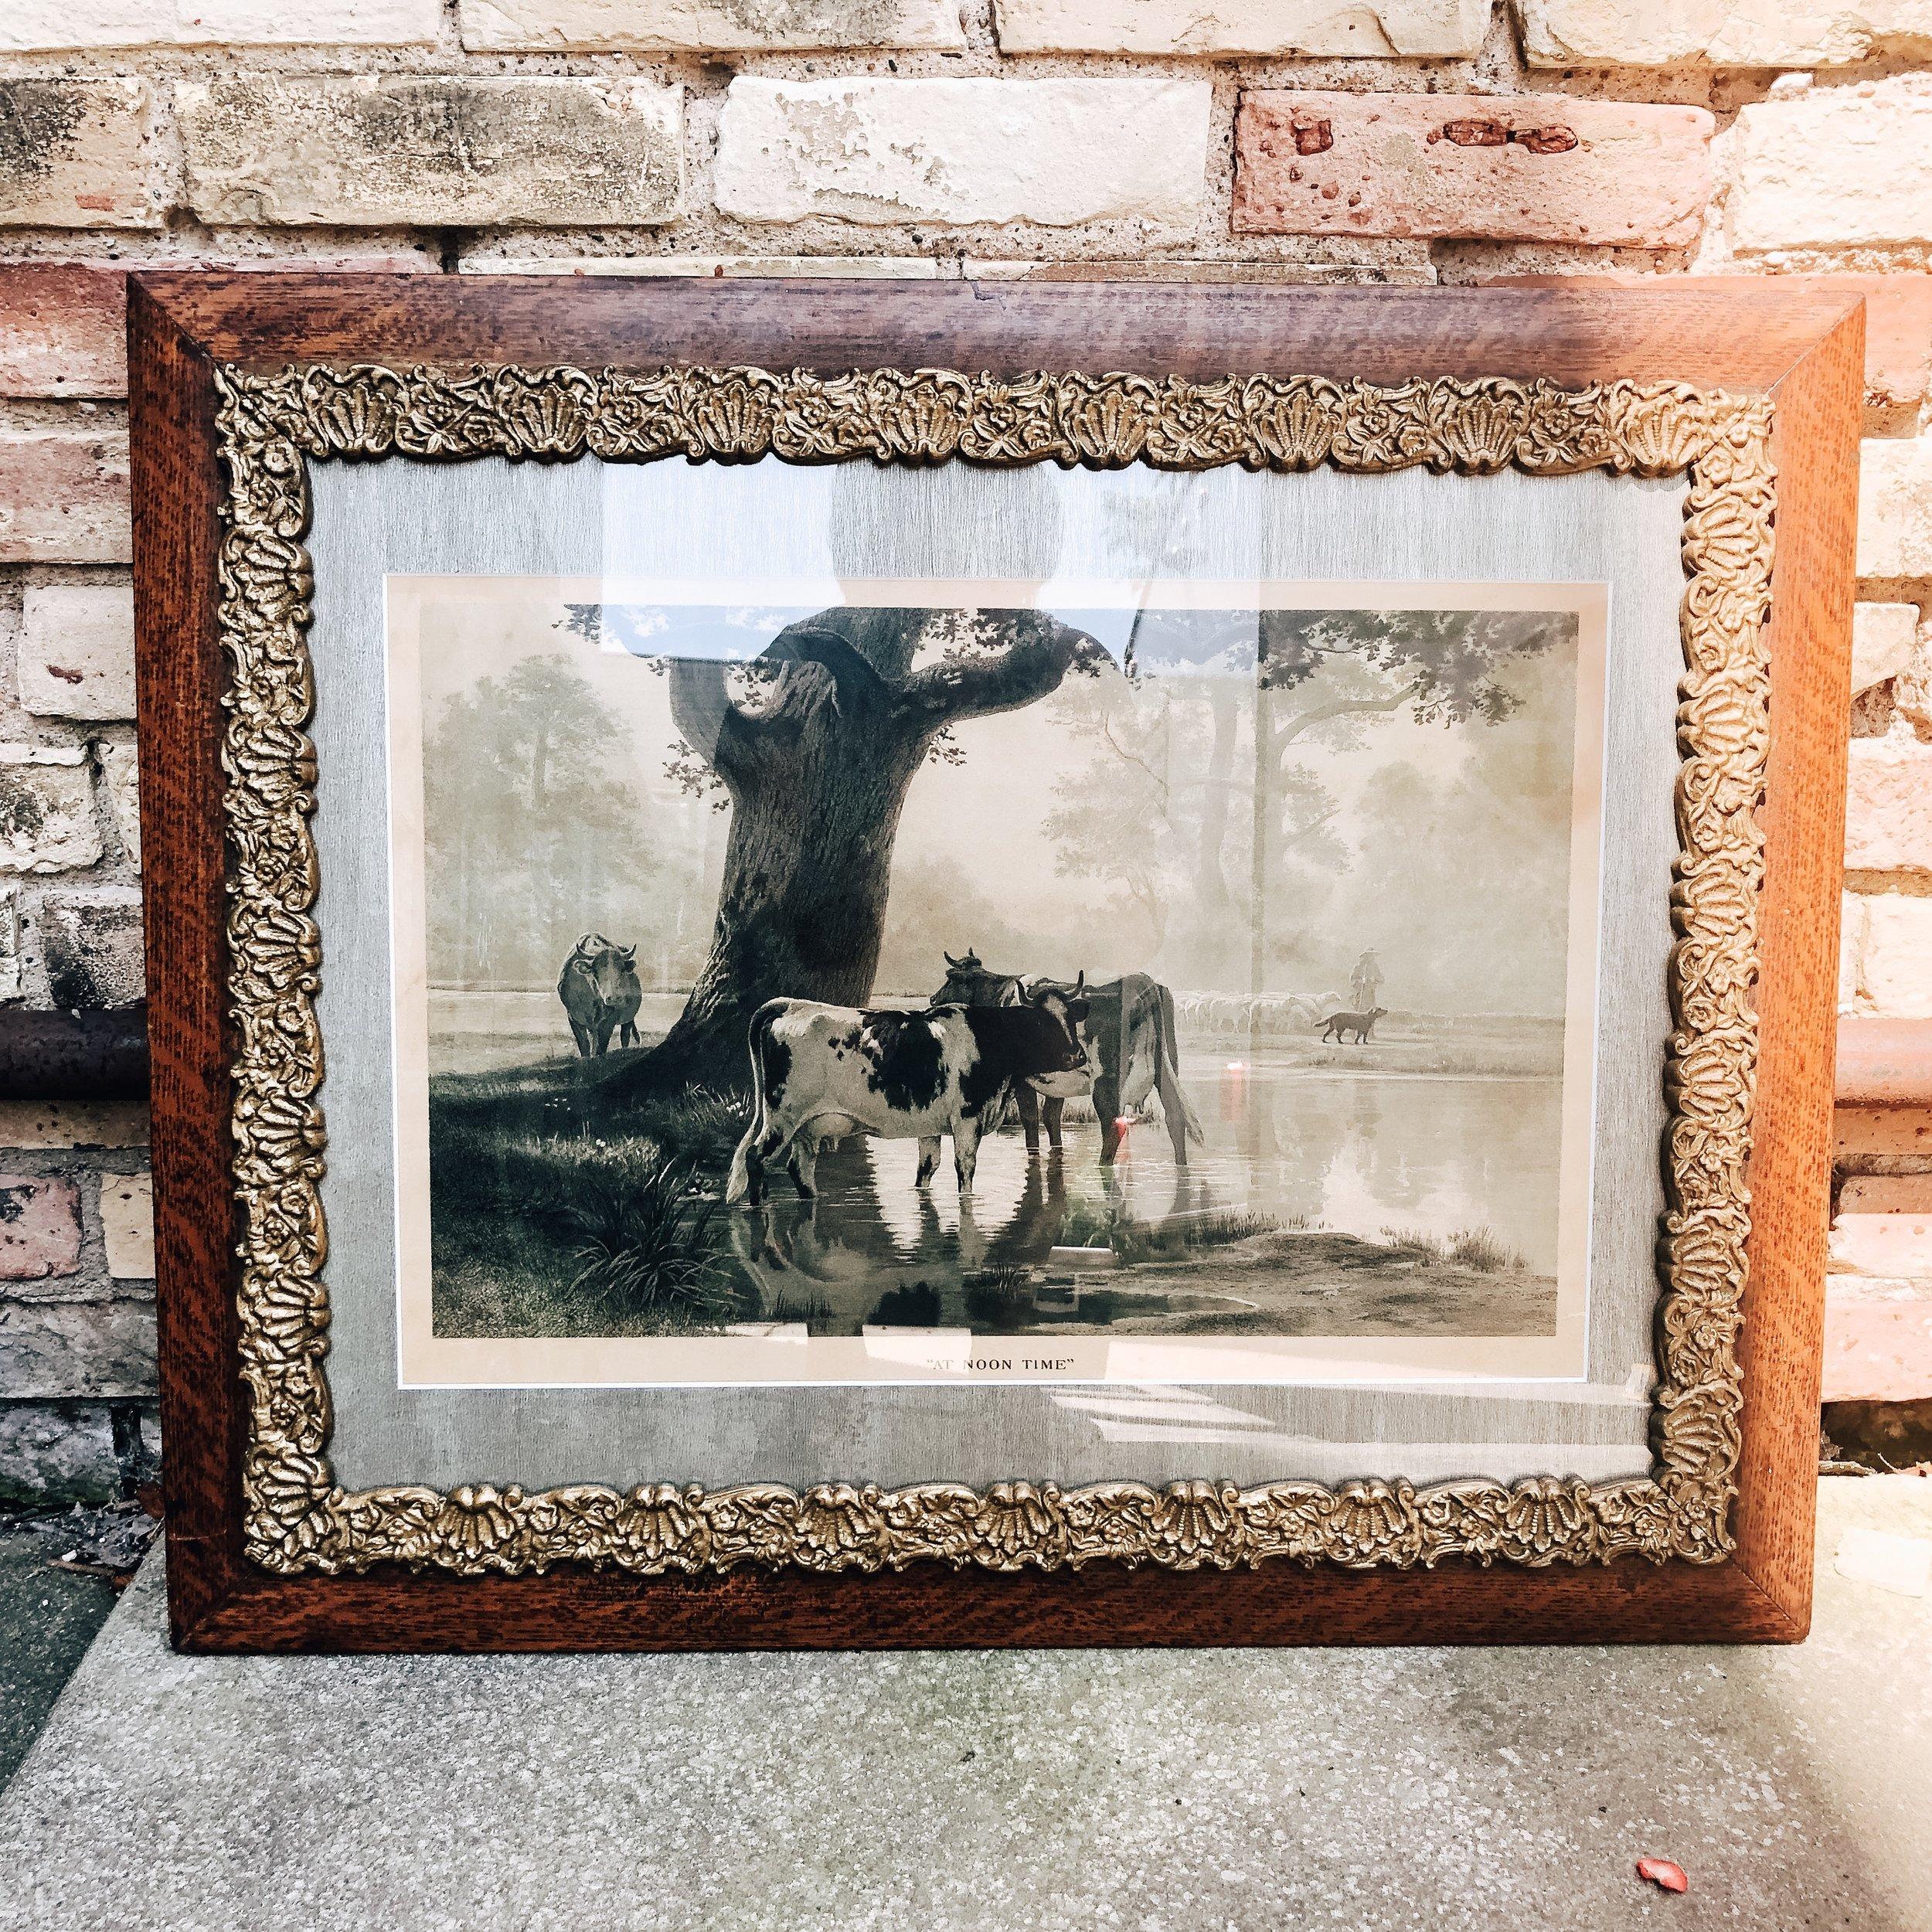 gallery-293-antique-frame.jpg